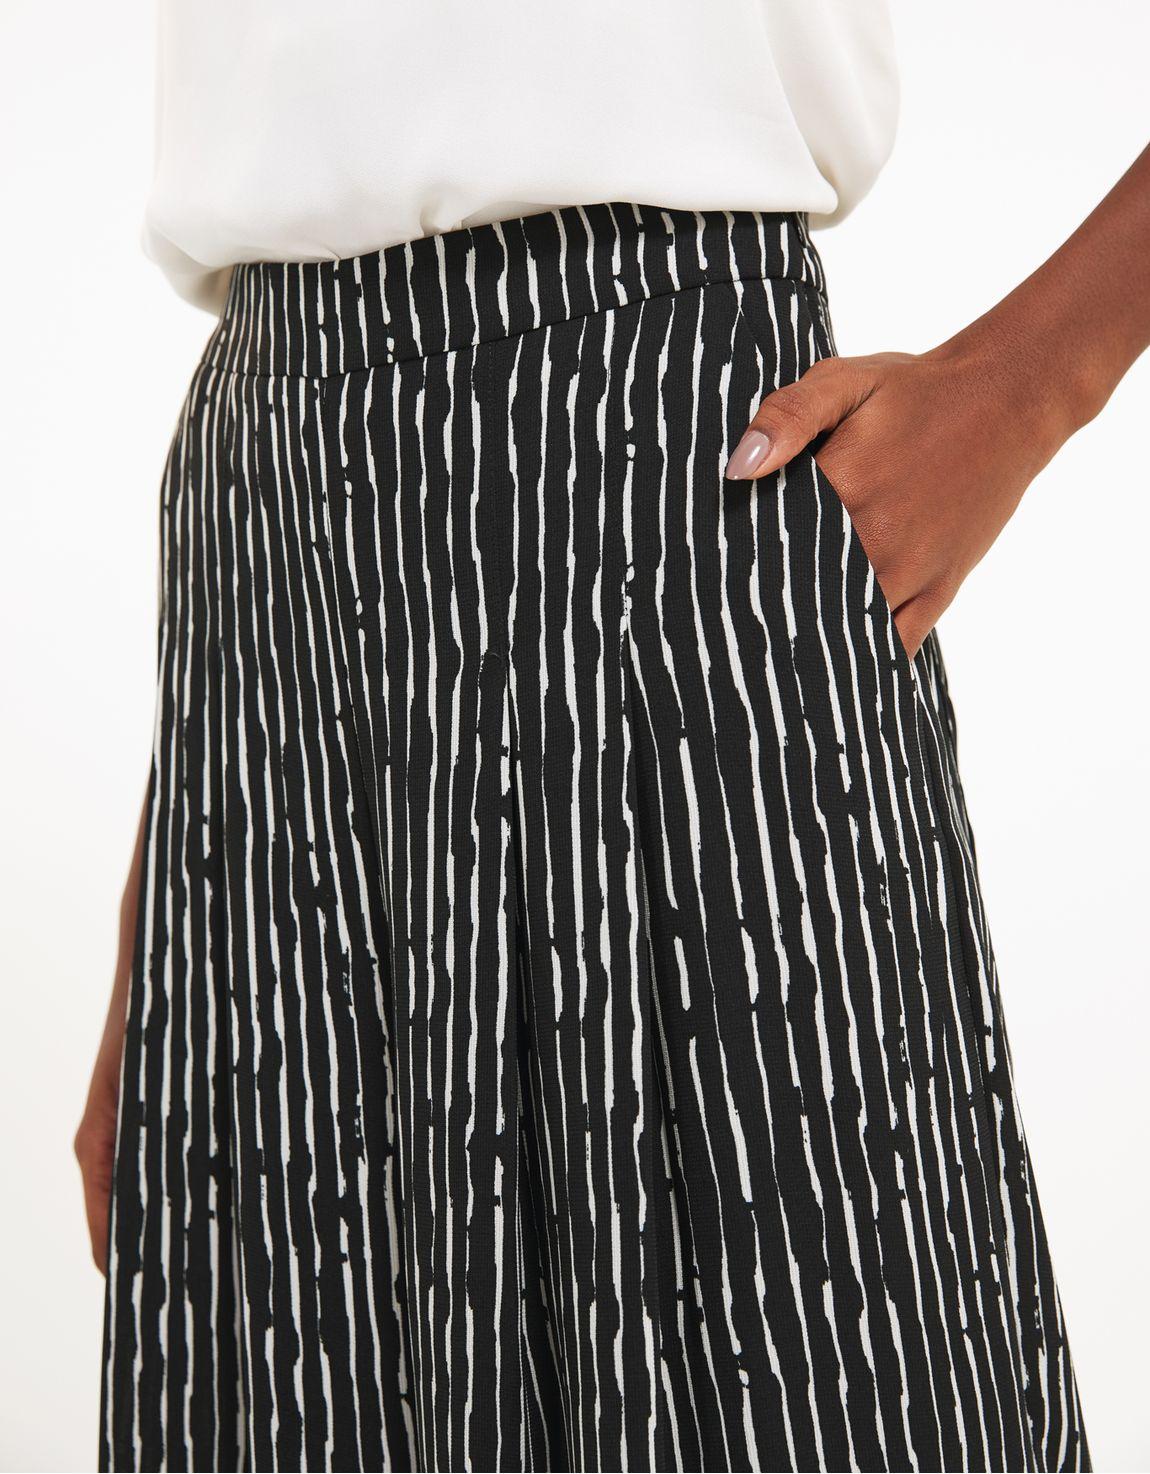 Pantalona listra pincelada preto